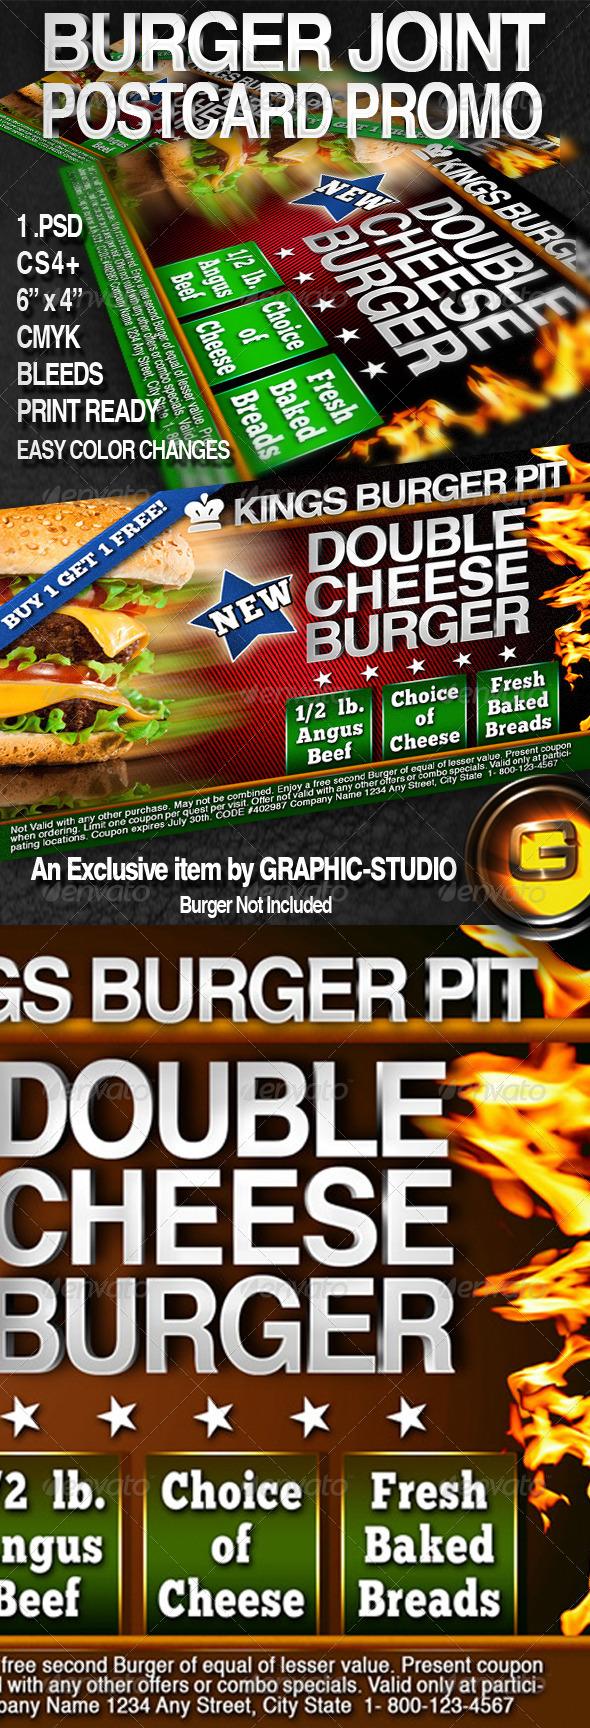 GraphicRiver Burger Postcard Promo 6x4 3067833